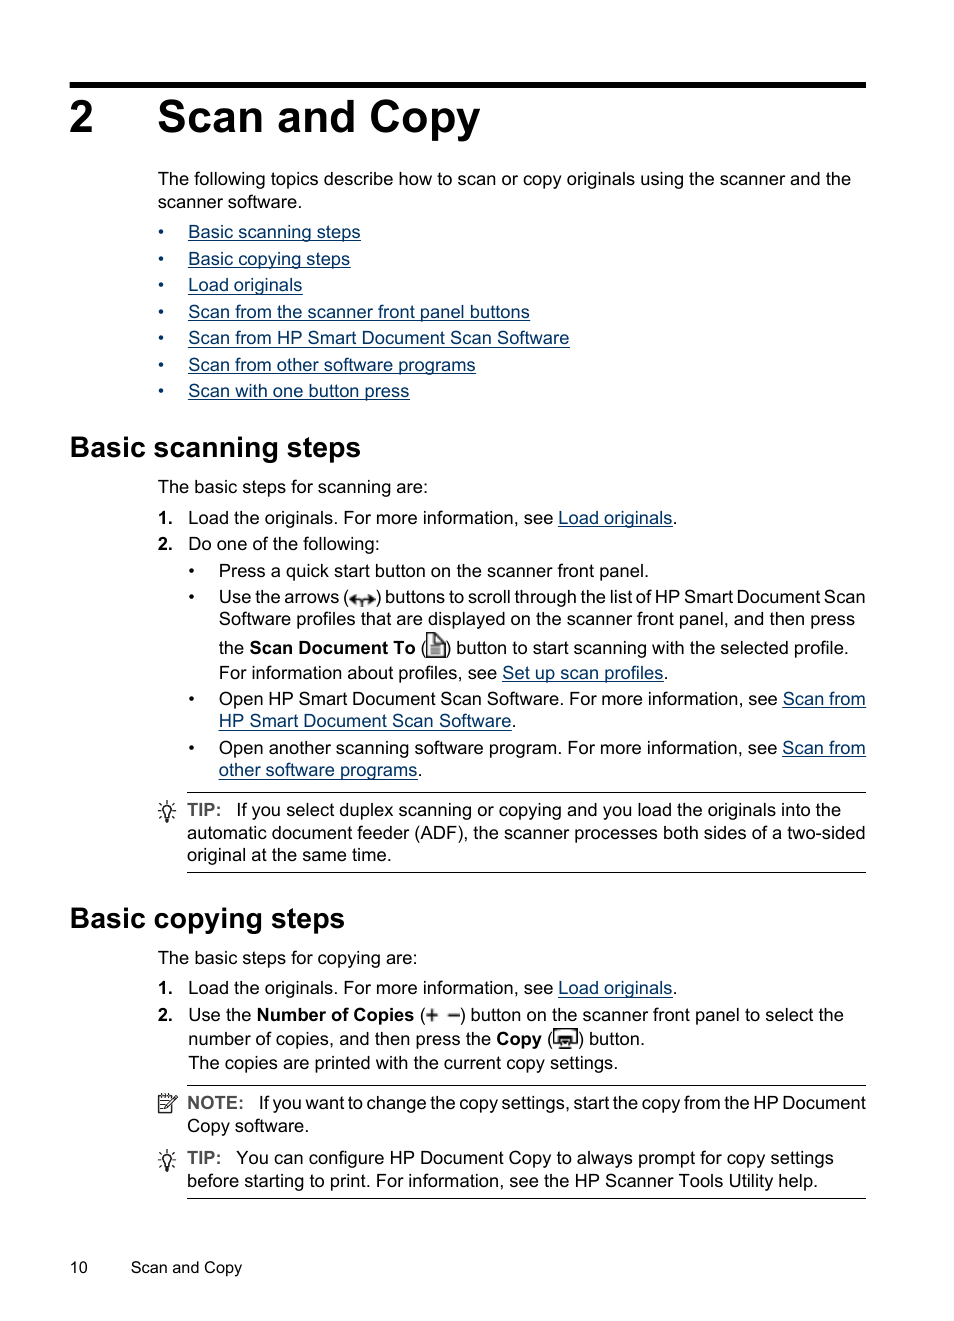 Scan and copy, Basic scanning steps, Basic copying steps | HP